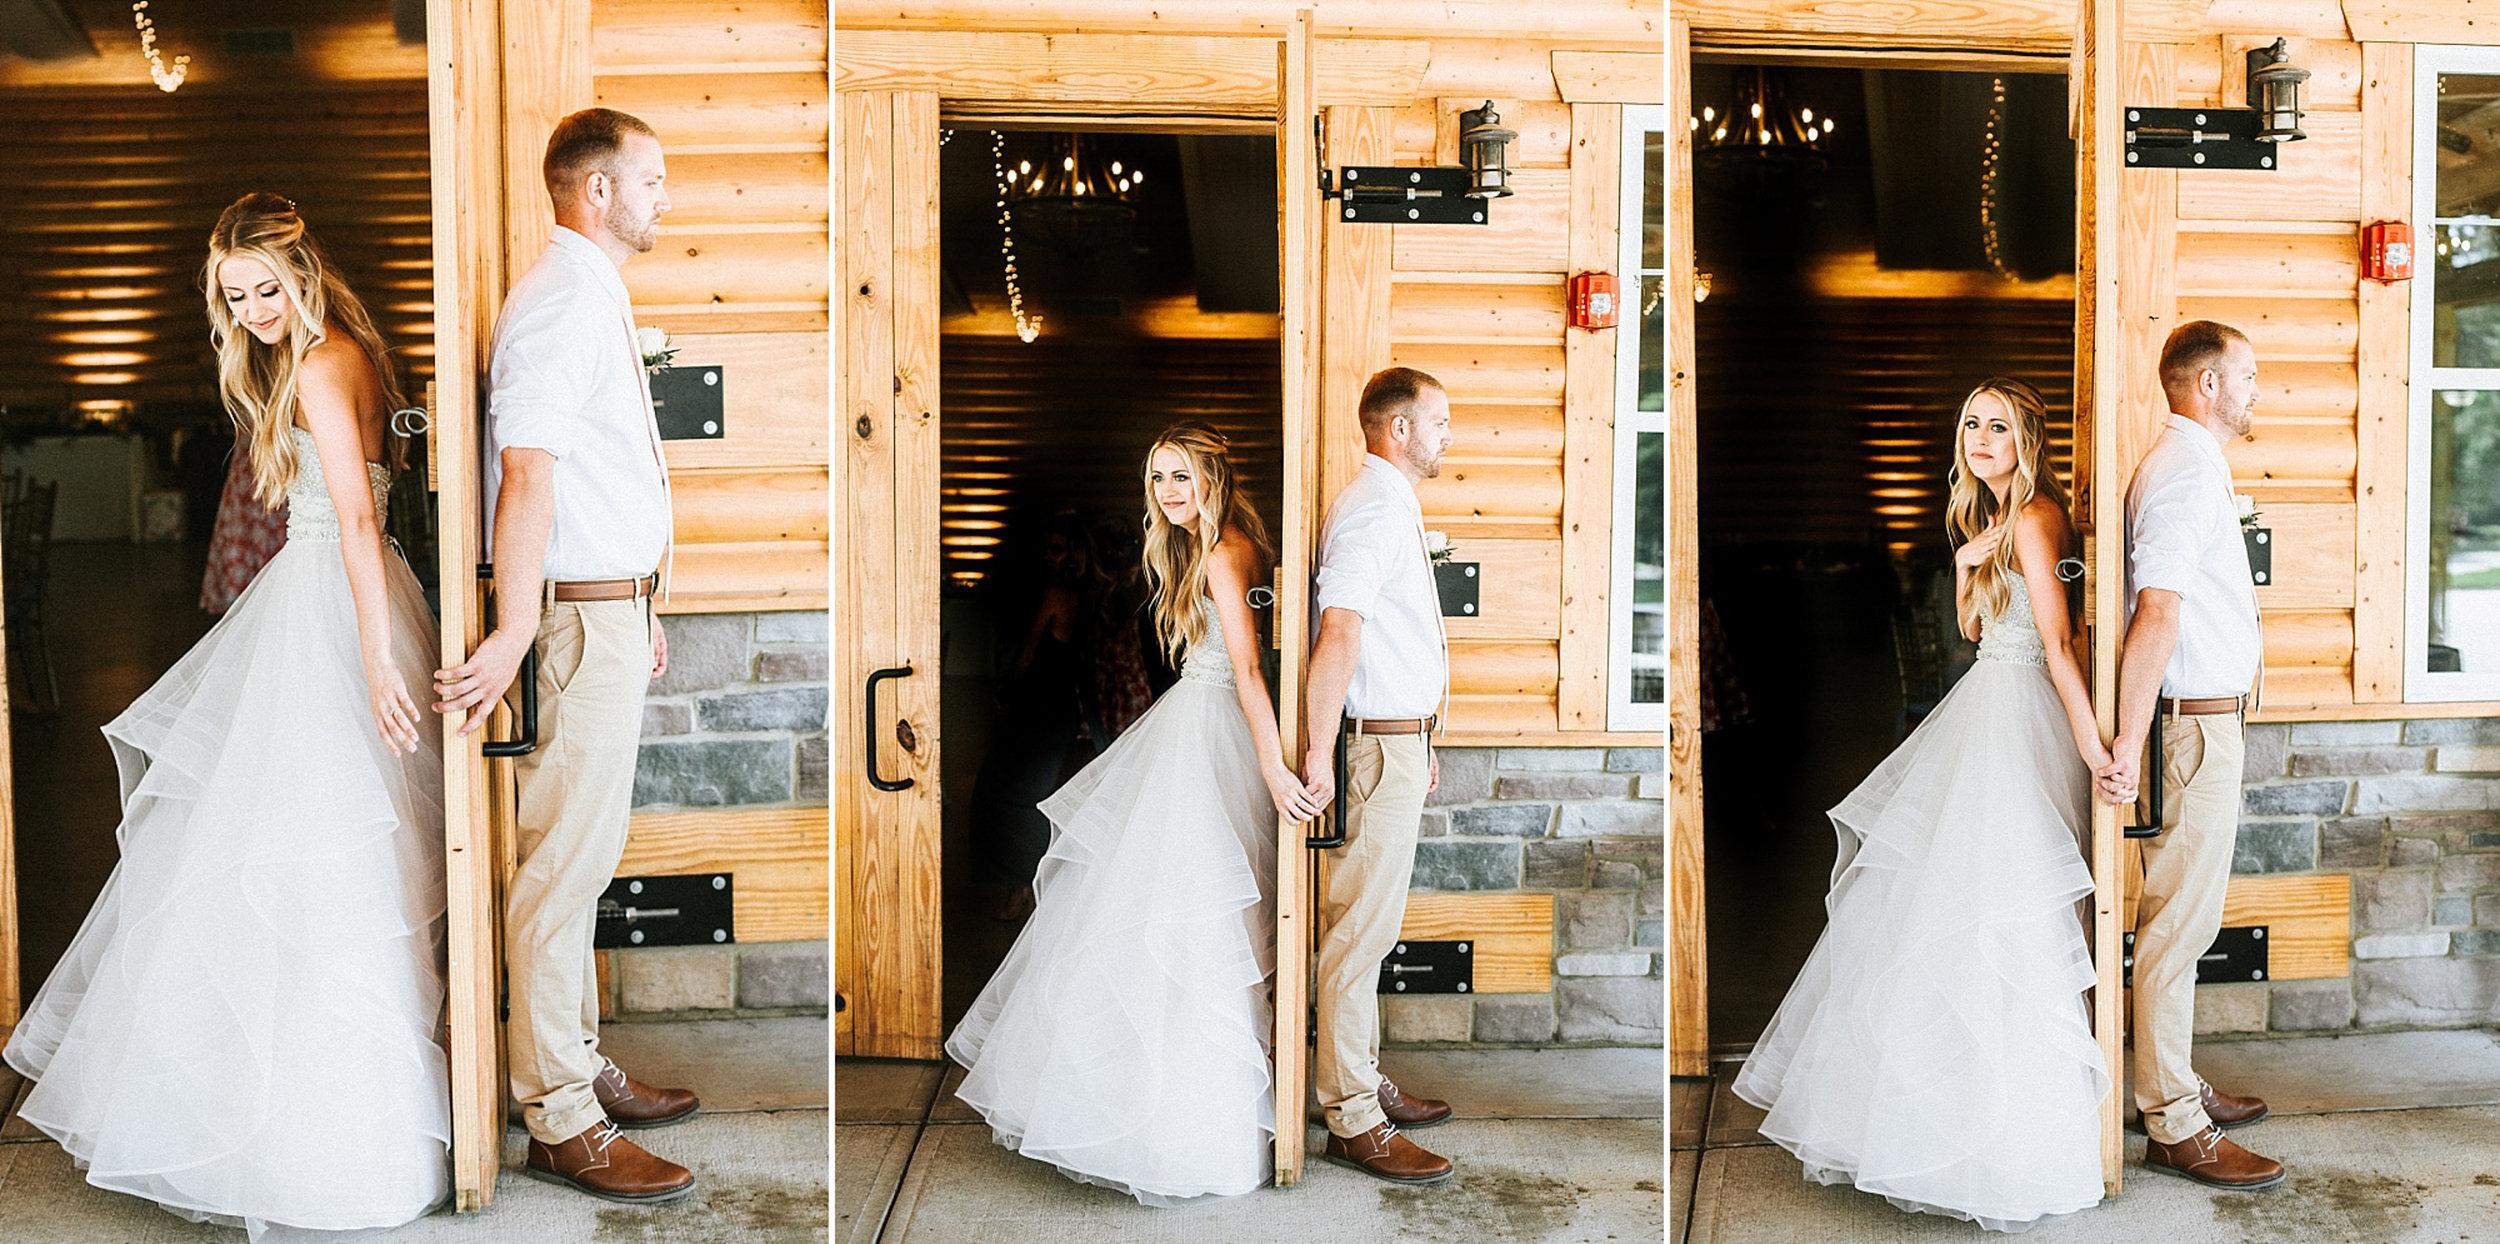 Brooke Townsend Photography - Cincinnati Wedding Photographer (43 of 153).jpg